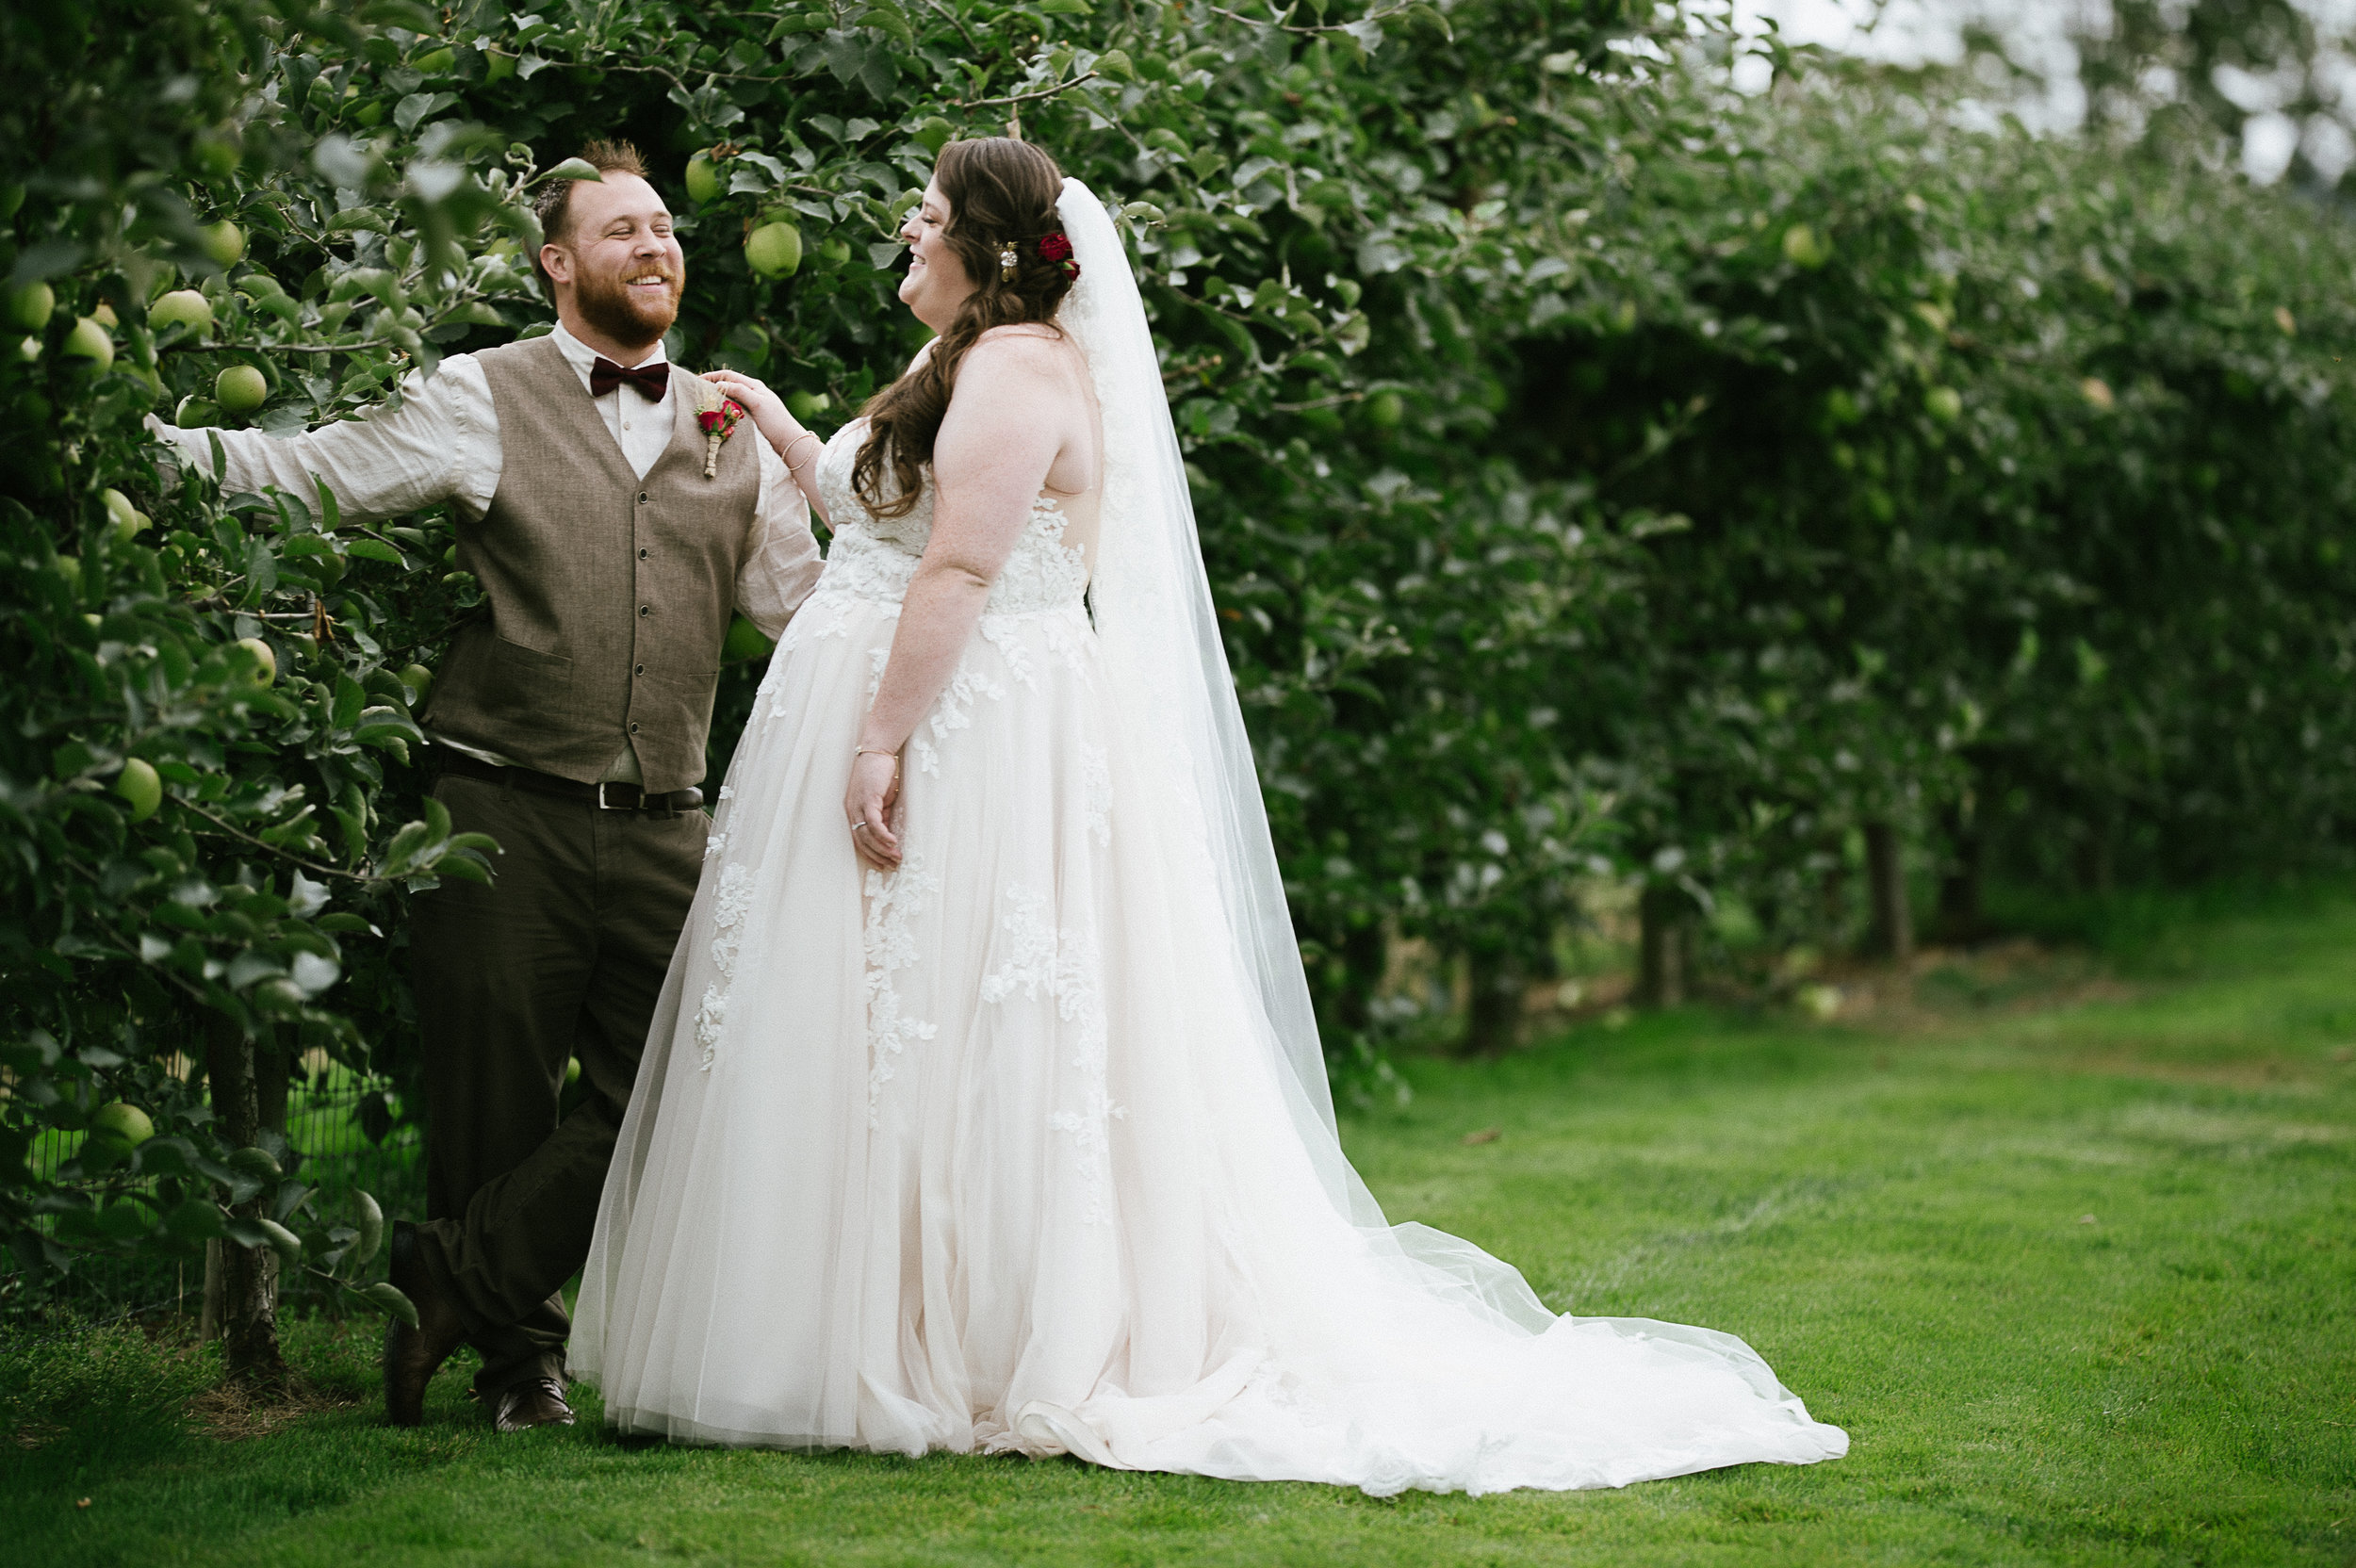 Swan Trail Farm Wedding_Sarah Schurman + Brian Skadan_Snohomish Wedding_Kelsey Lane Photography-5802.jpg